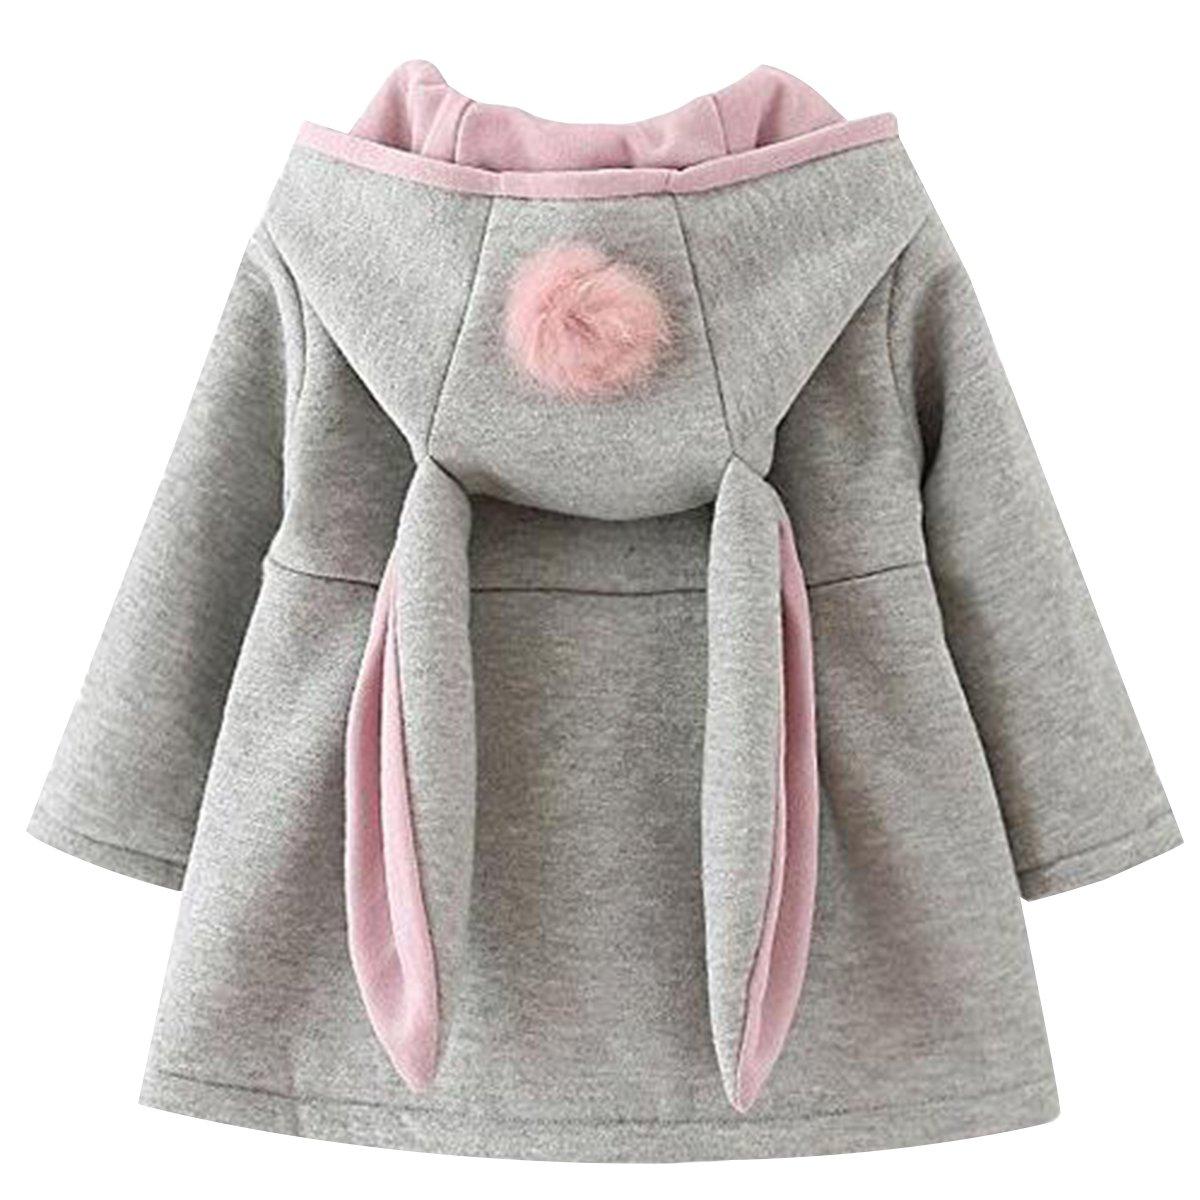 Bai You Mei Baby Girls Toddler Kids Rabbit Ear Winter Cotton Warm Jacket Coat Outerwear Hood Hoodie